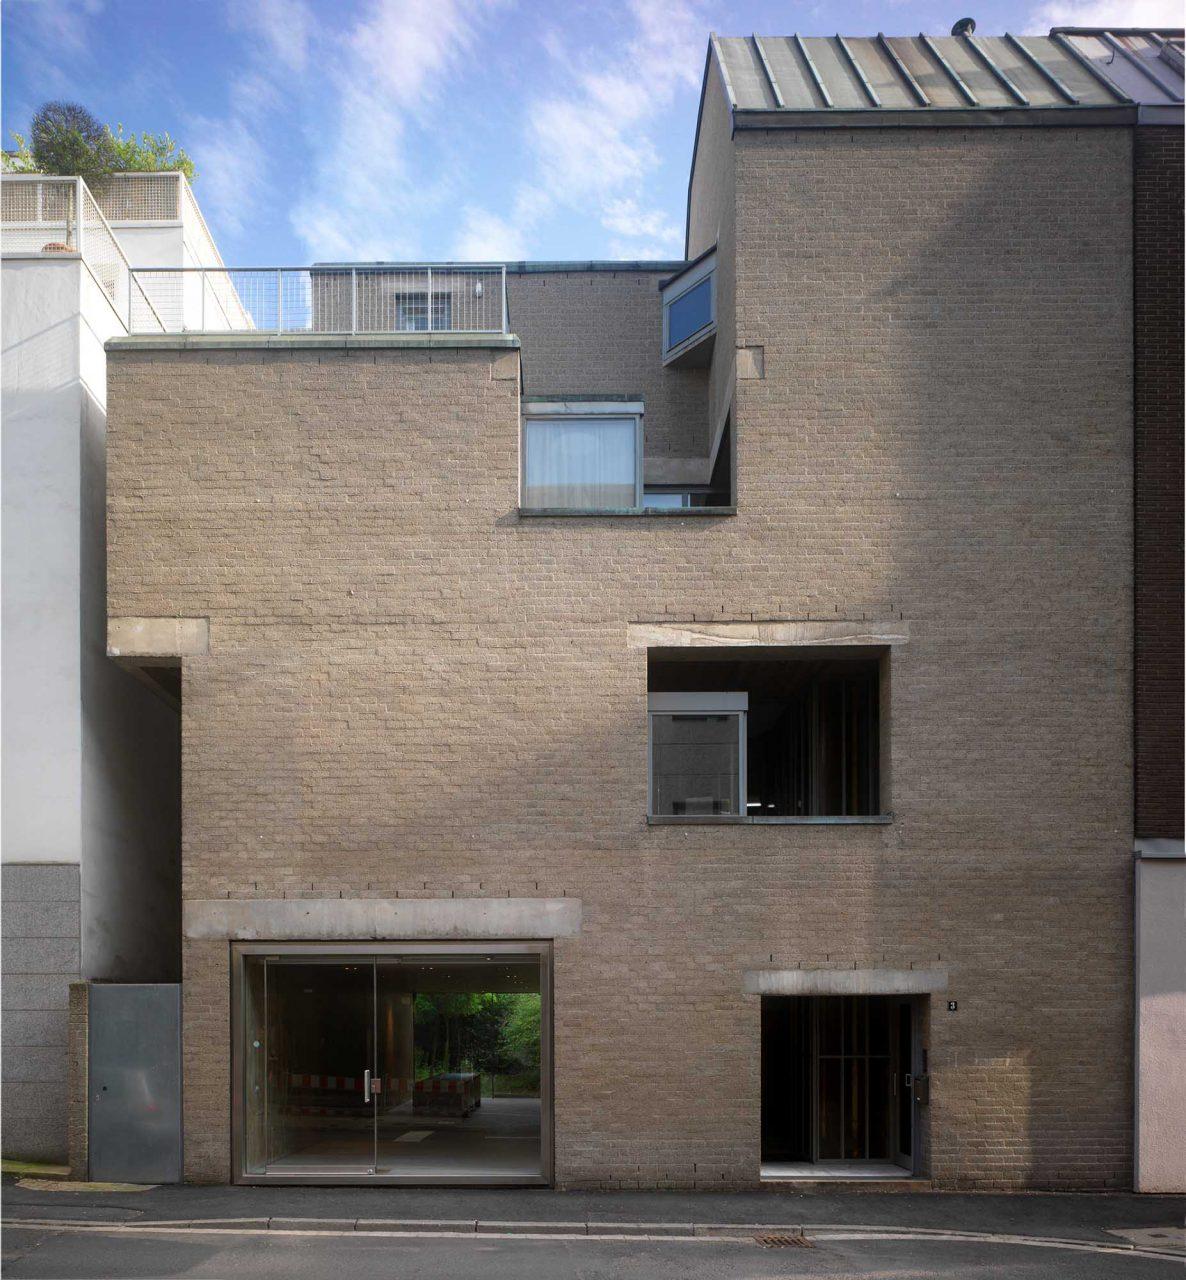 Schmela Haus. By Dutch architect Aldo van Eyck. Completion: 1971. Built for the avant-garde art dealer Alfred Schmela.